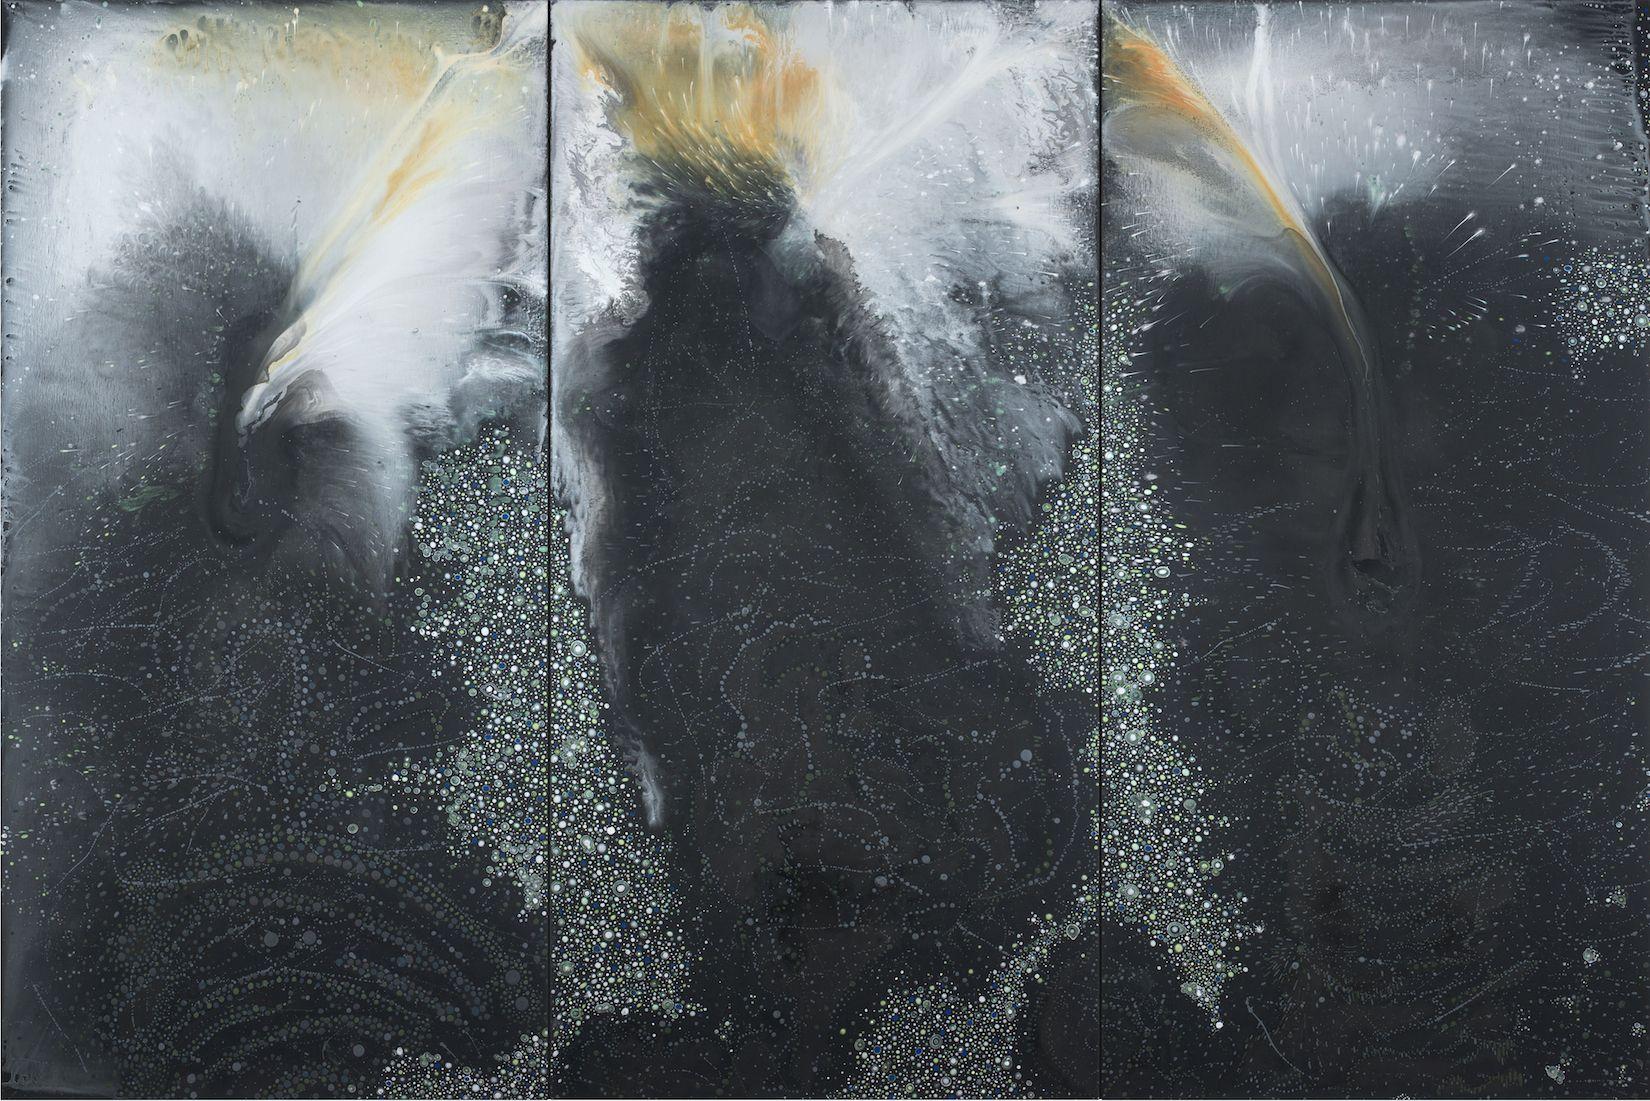 Black Triptych (blaze), 2016, Acrylic on linen, 72 x 108 inches